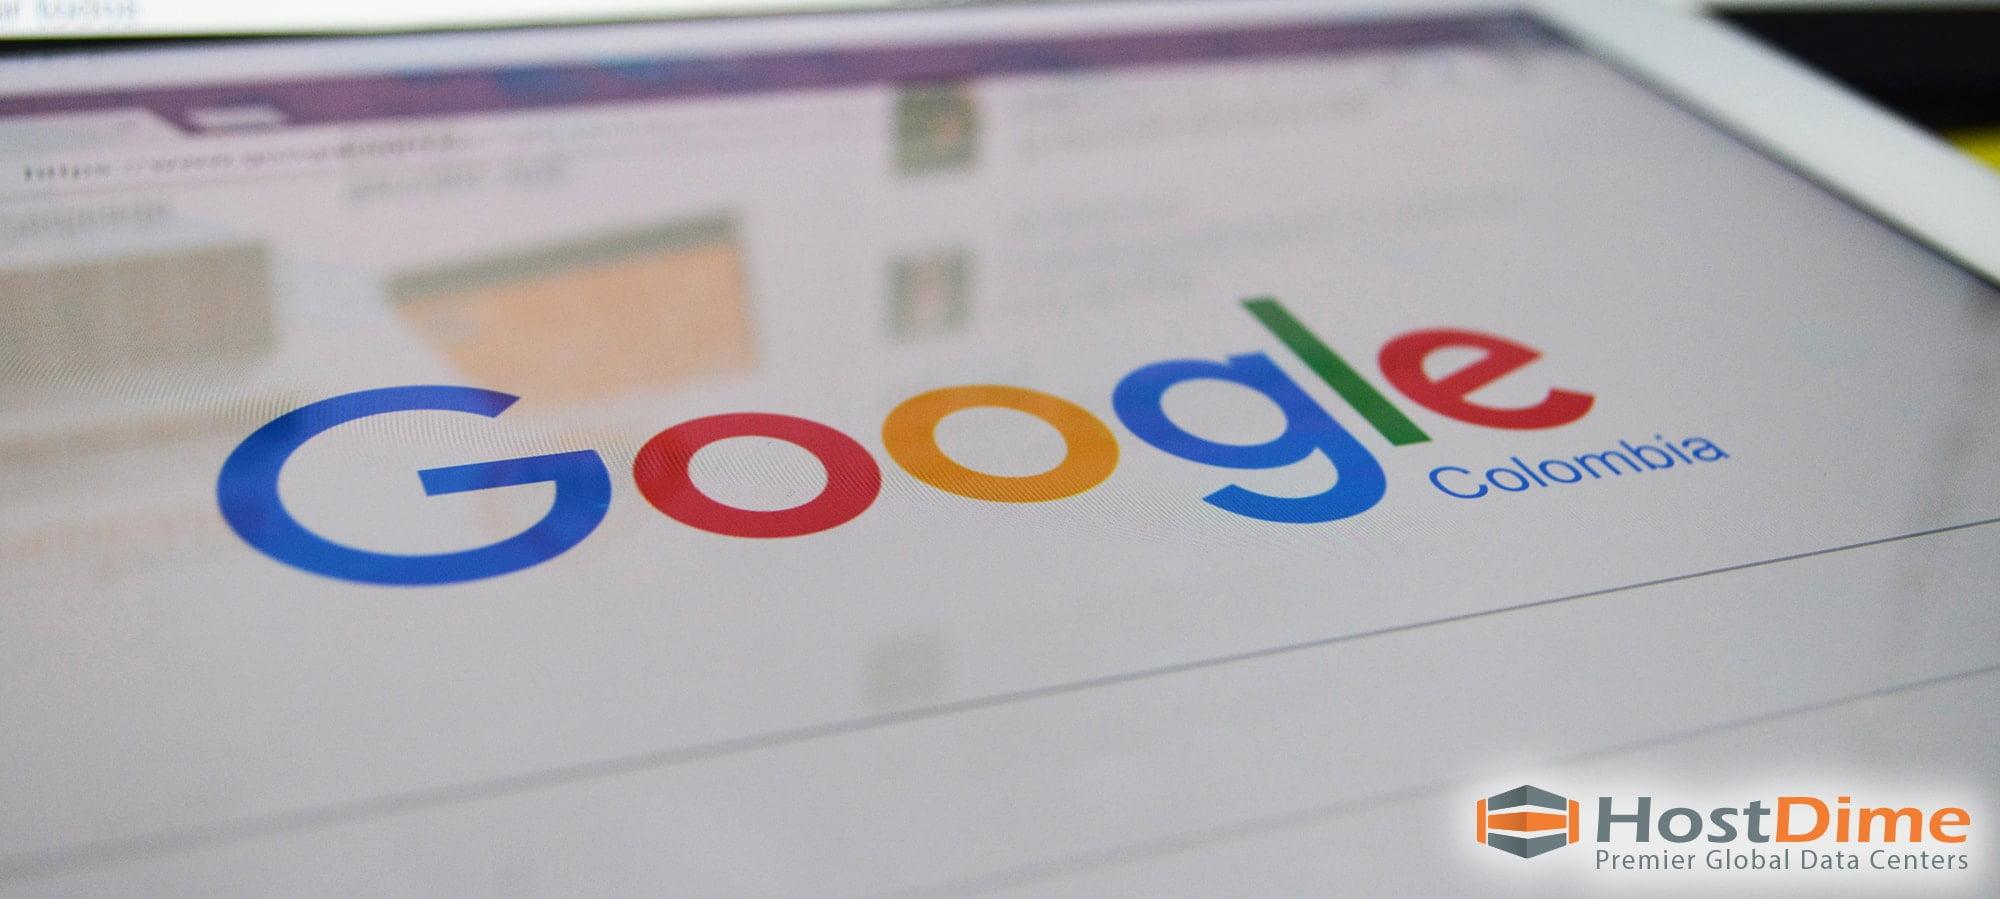 Trucos Busqueda Google